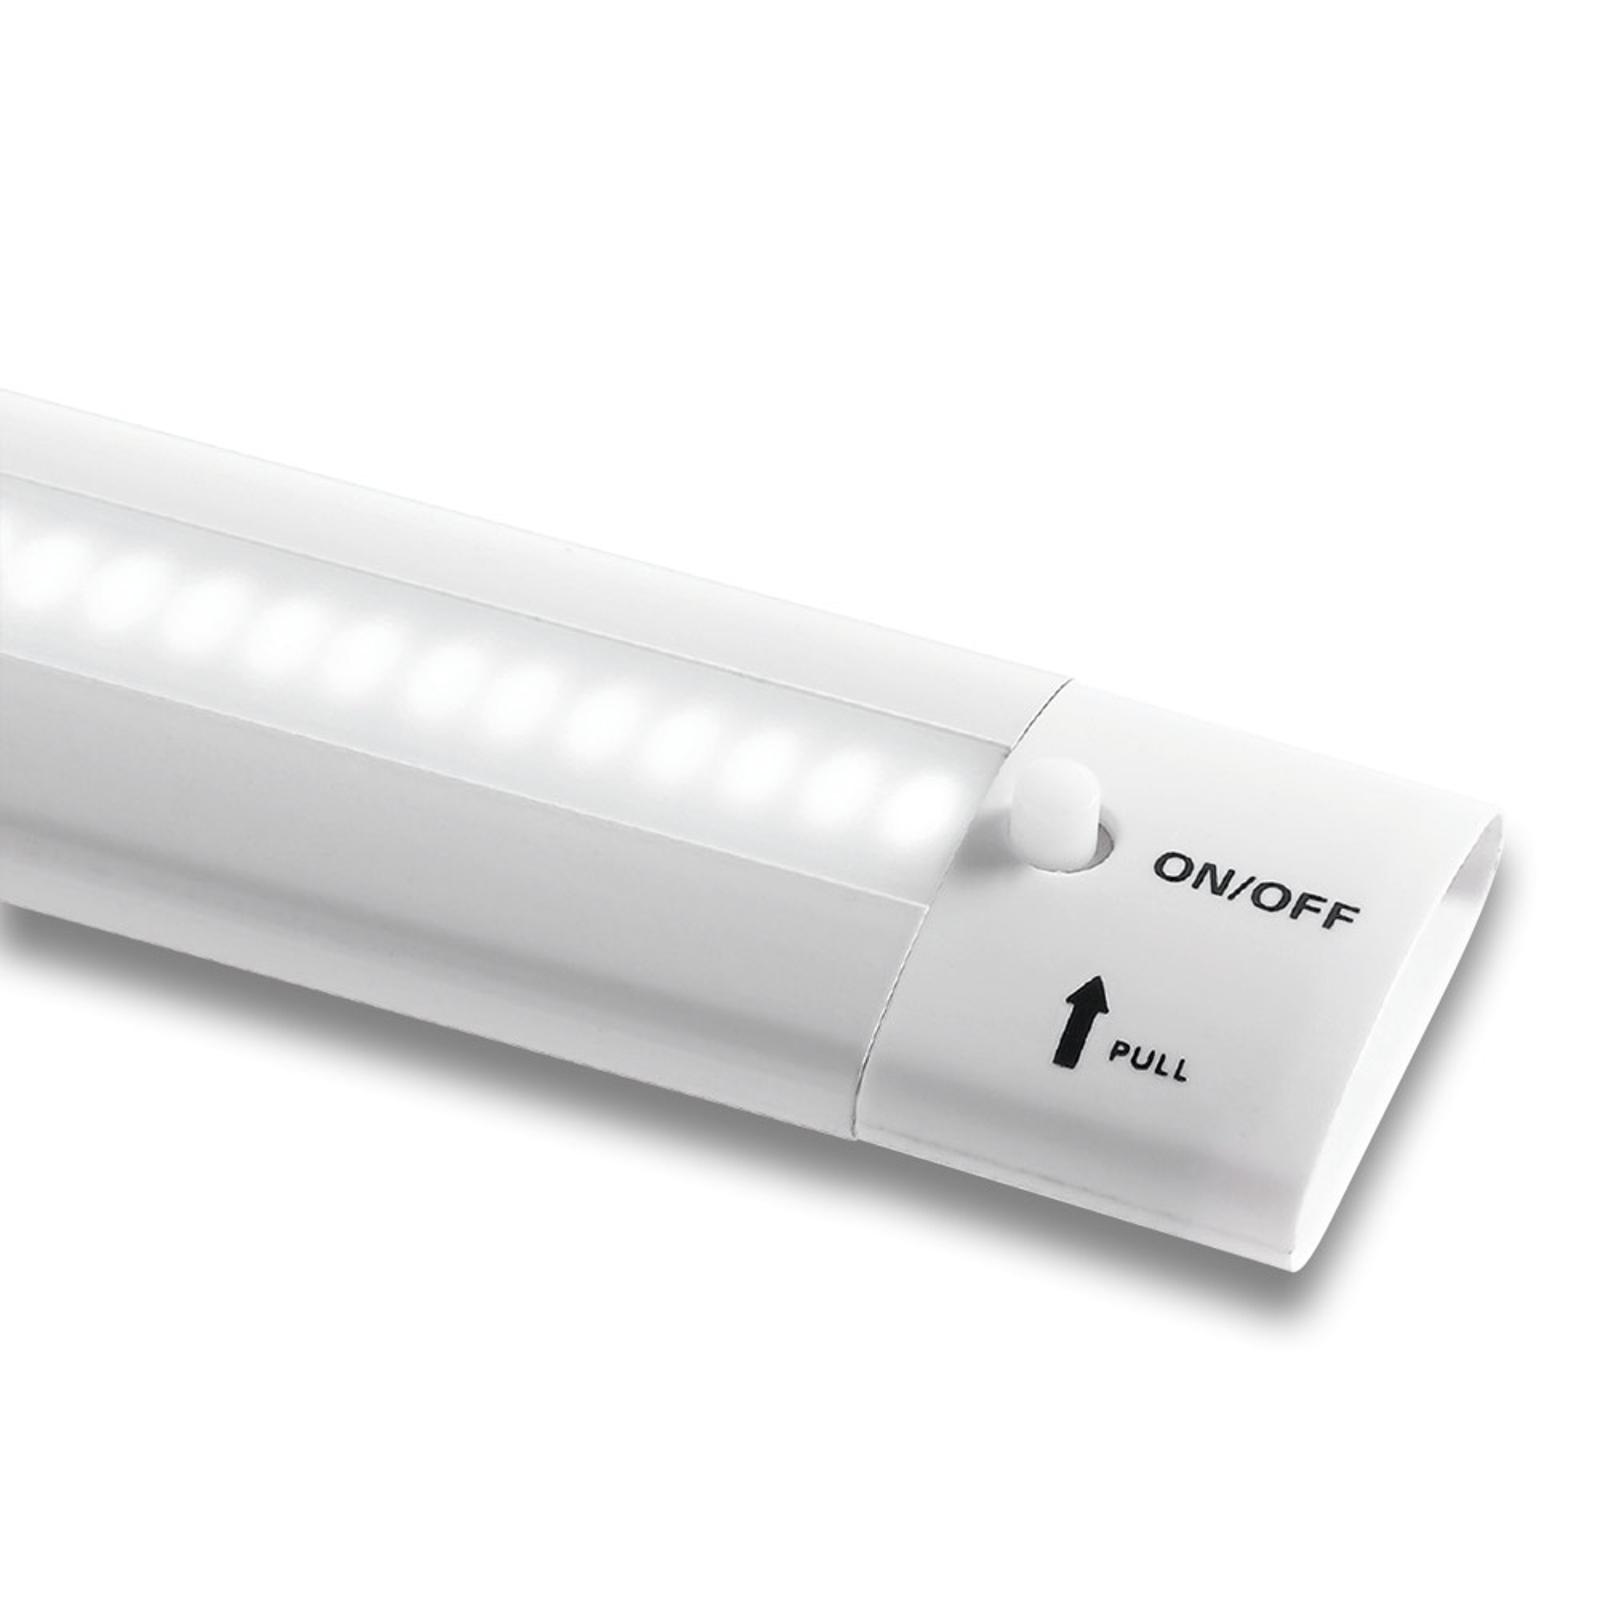 Applique sous meuble LED Galway 6690,16W, blanc